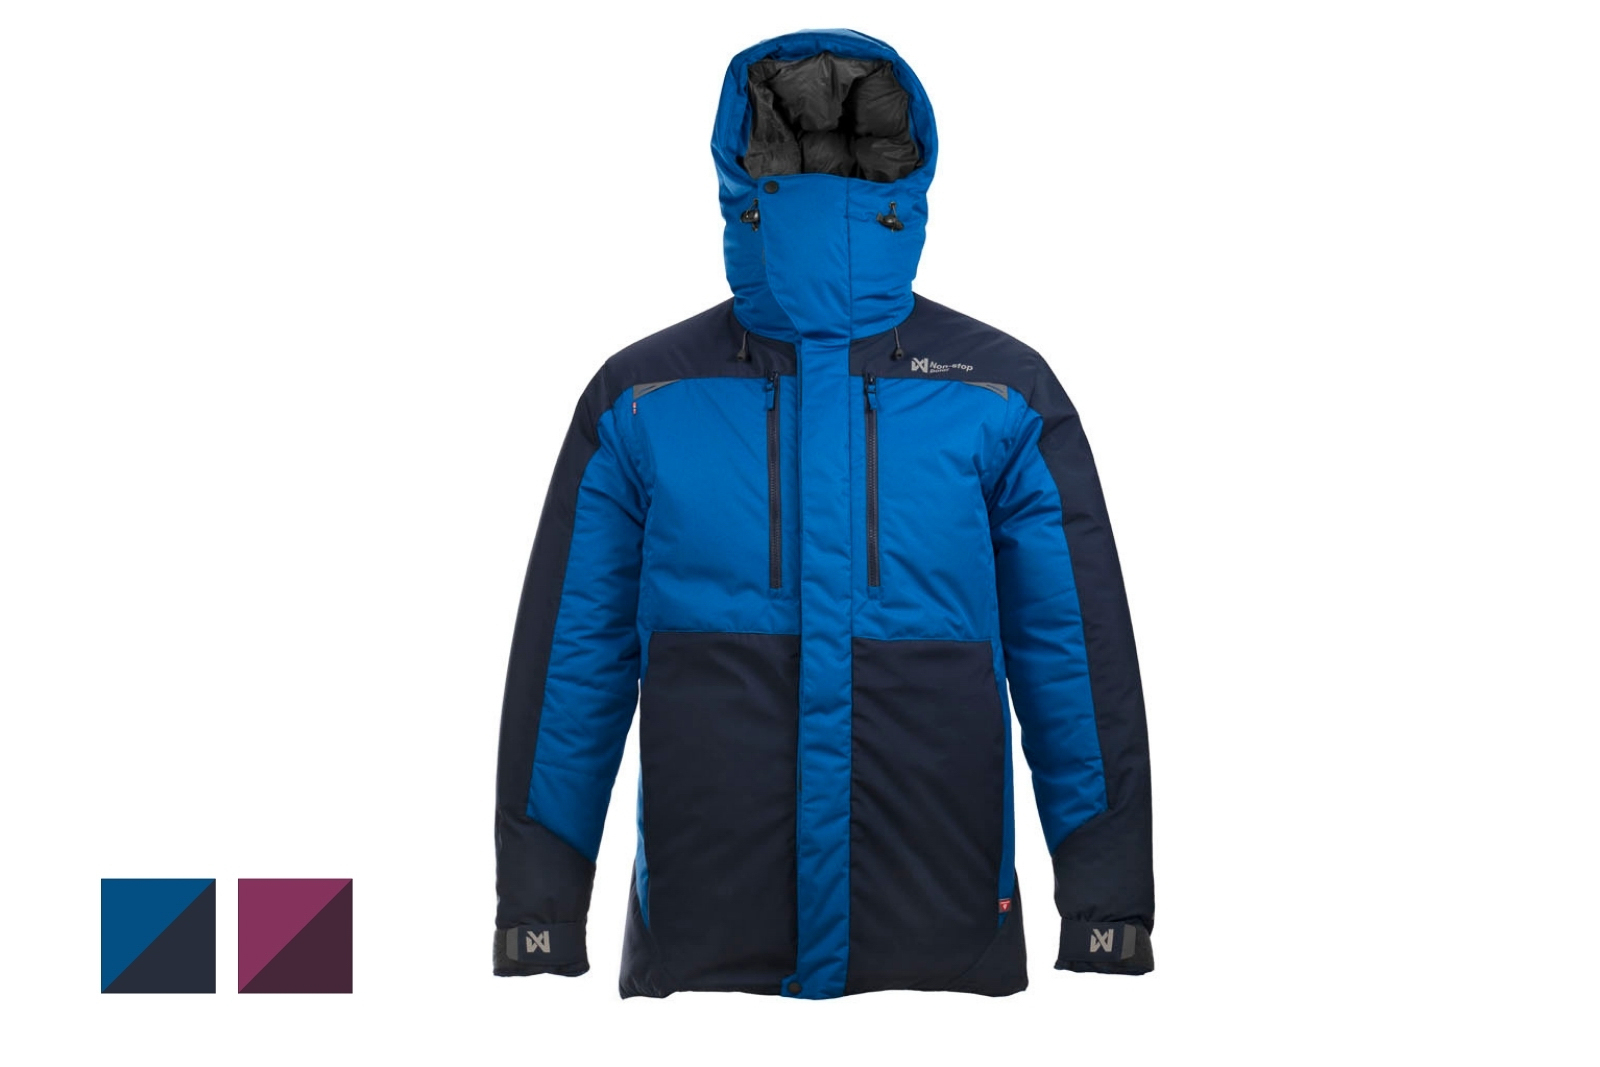 Arctic jakka pro